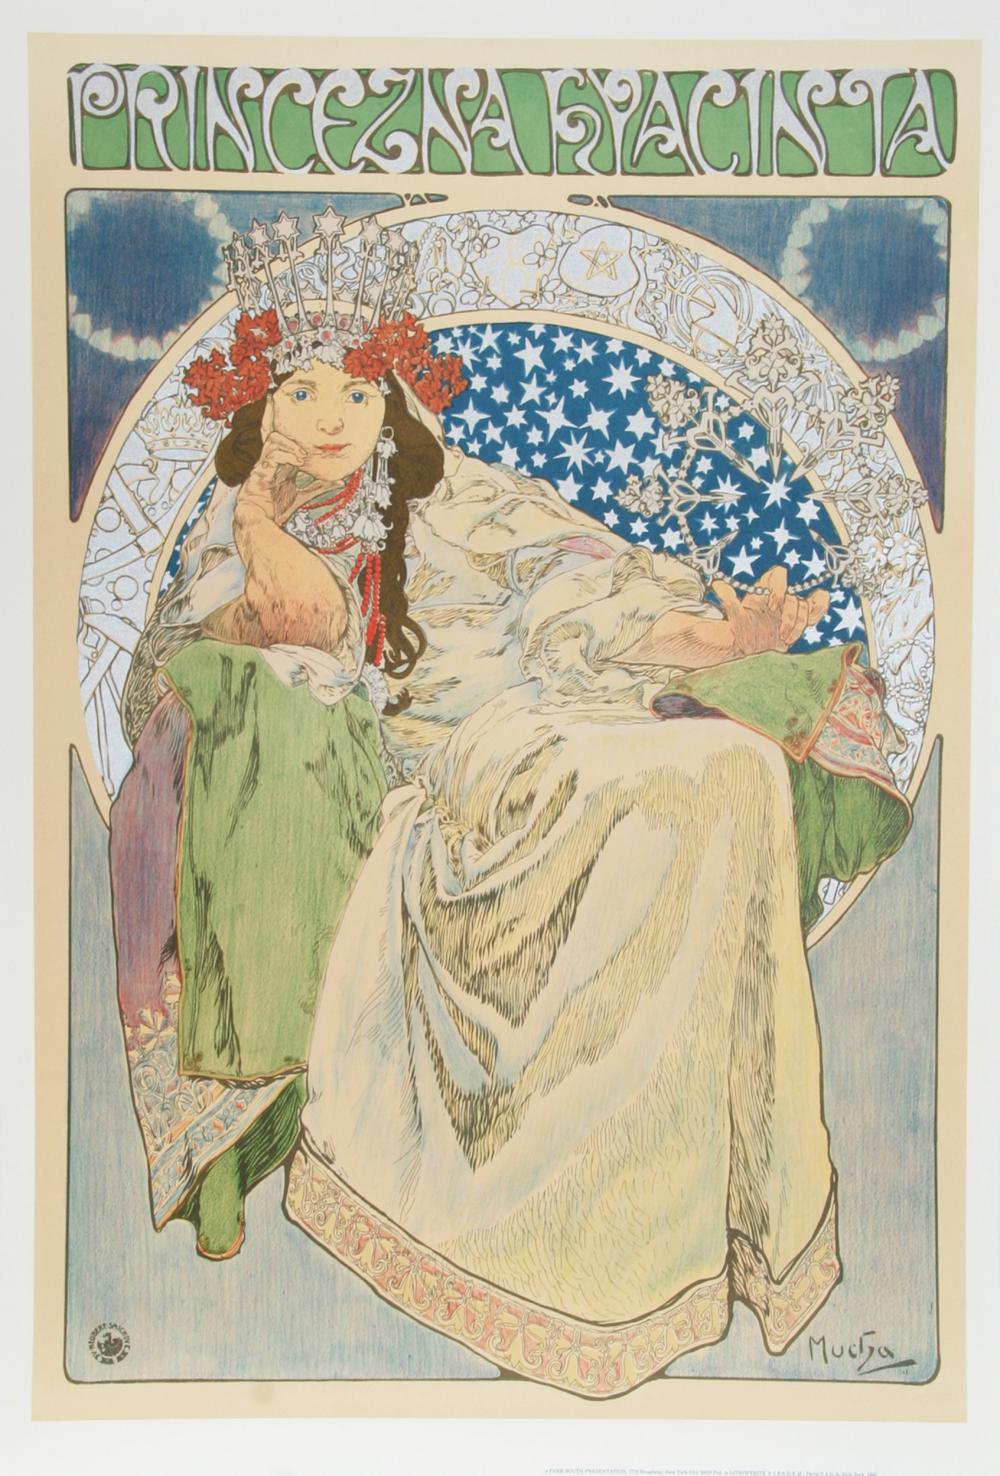 Alphonse Mucha, Princezna Hyacinta, Lithograph Poster